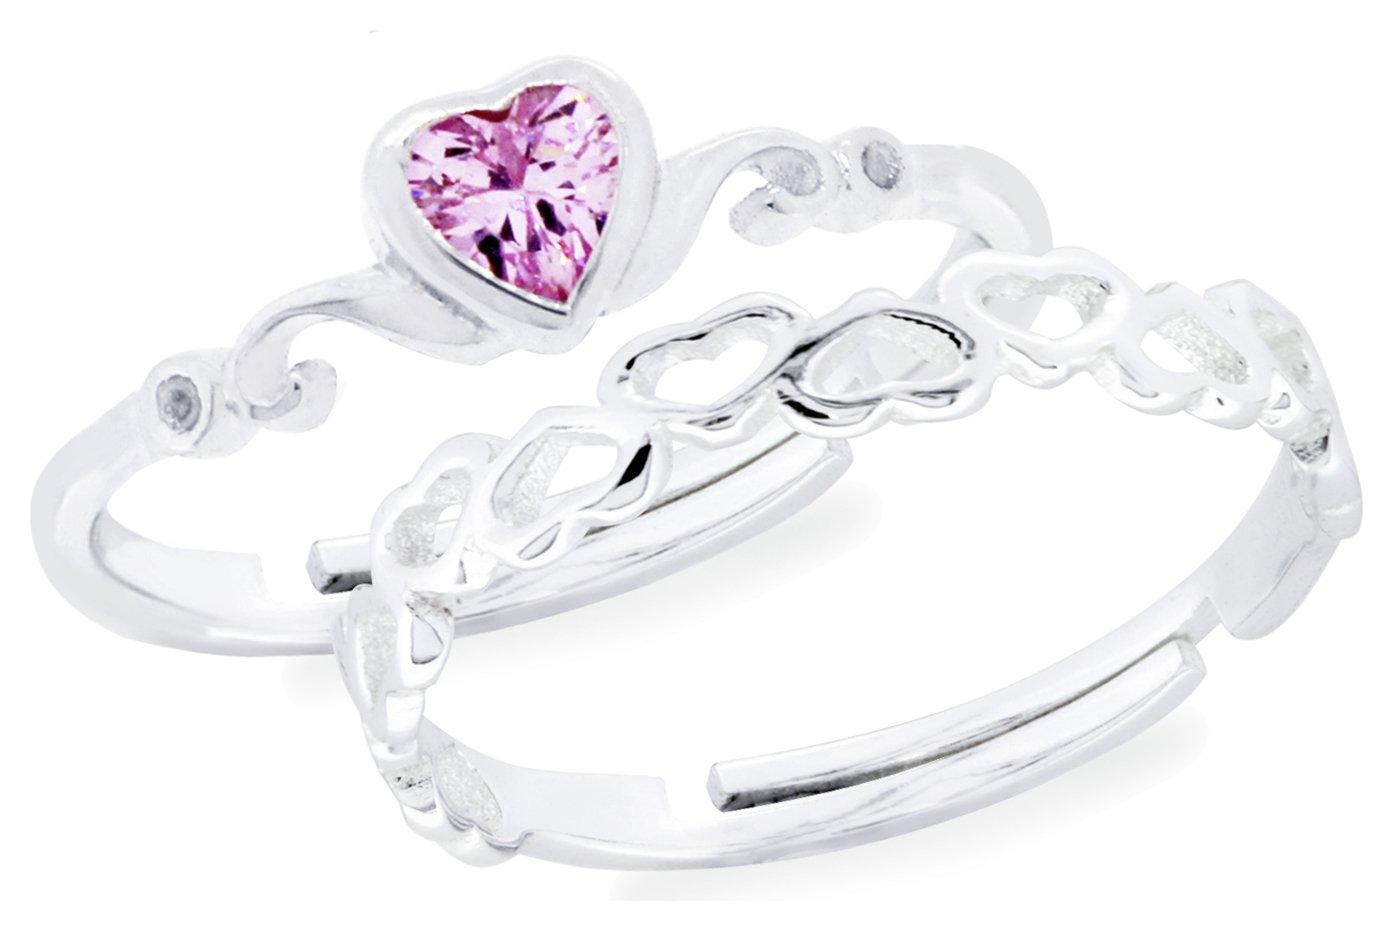 Revere Kids Sterling Silver Heart Adjustable Rings -Set of 2